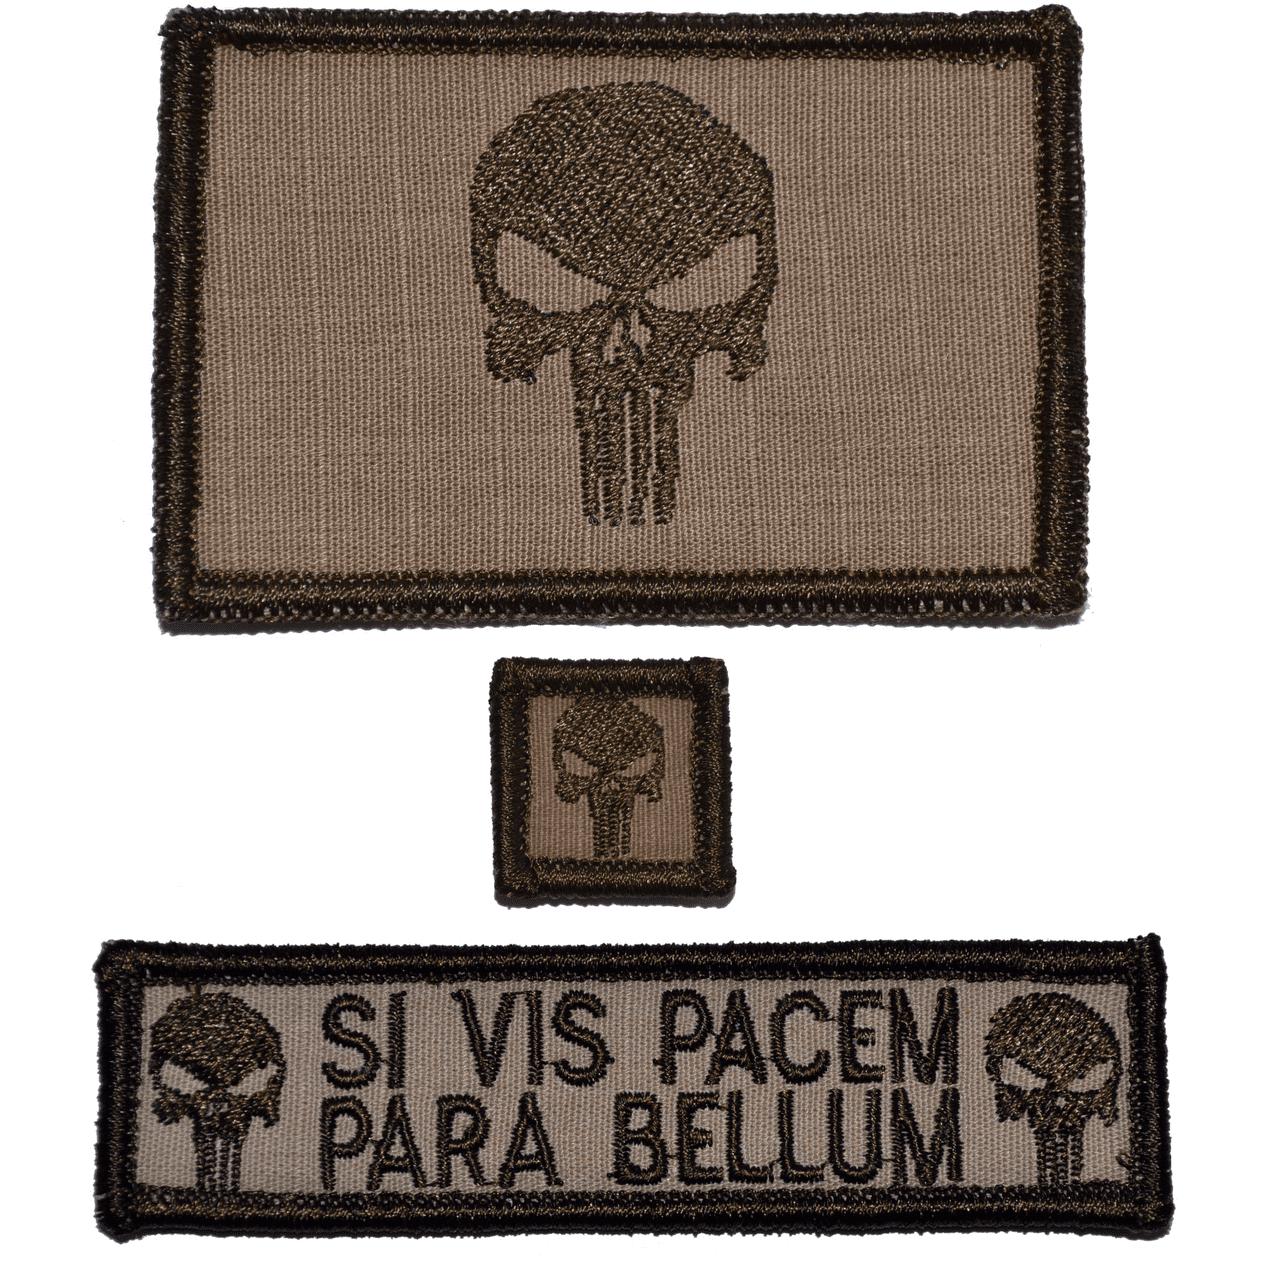 Patch Set: Punisher Skull 2x3, Si Vis Pacem 1x3.75, Punisher Skull 1x1